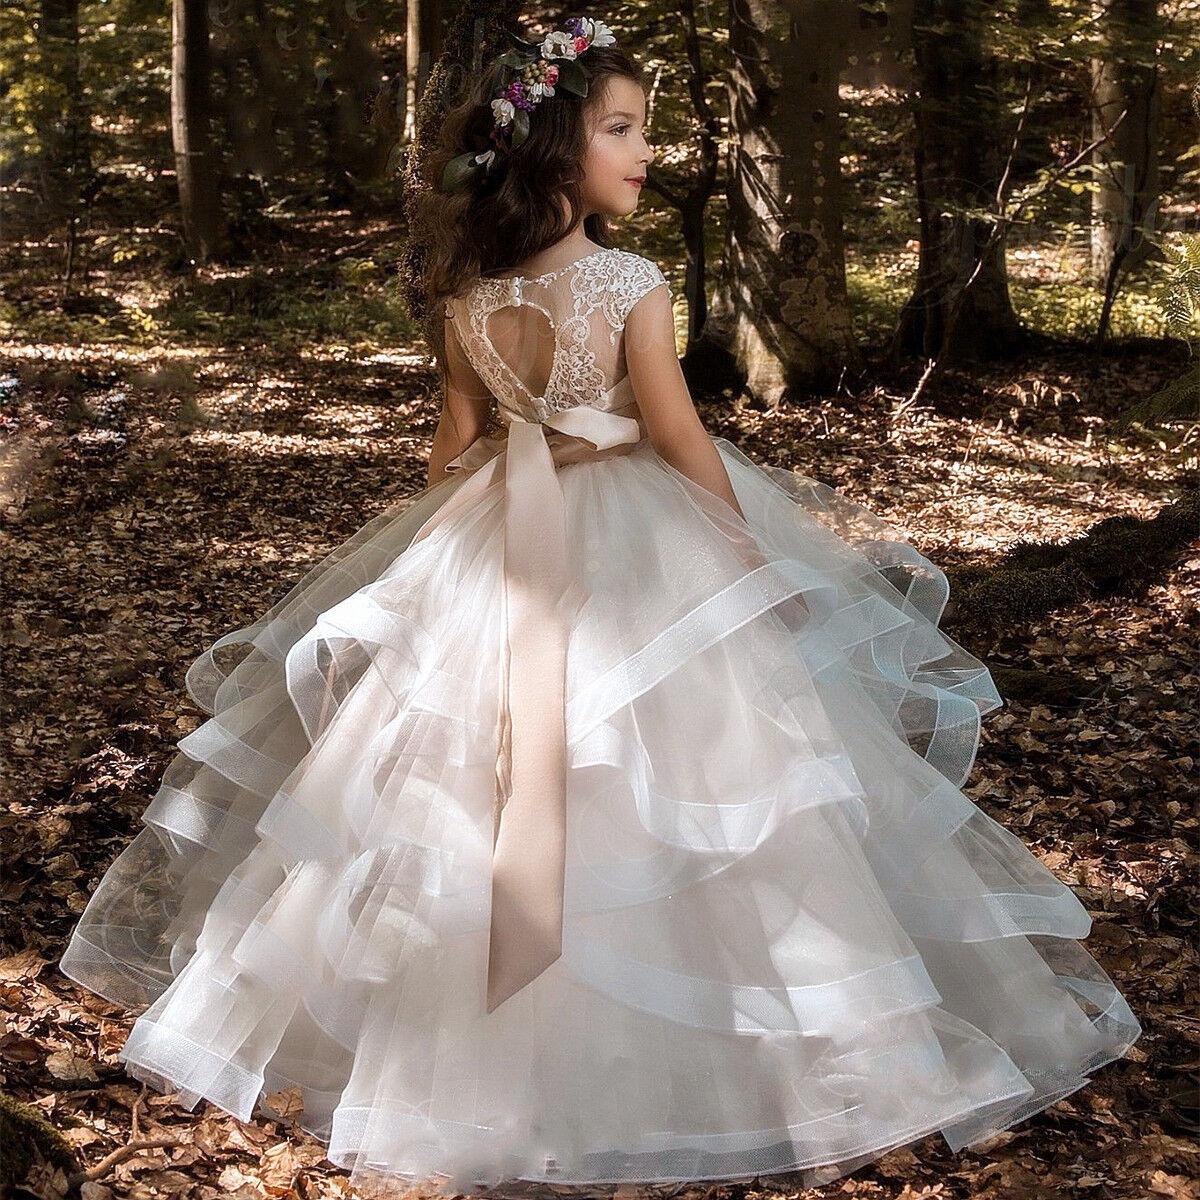 76c7f1b54a1 Couture Princess Flower Girl Dresses - Gomes Weine AG